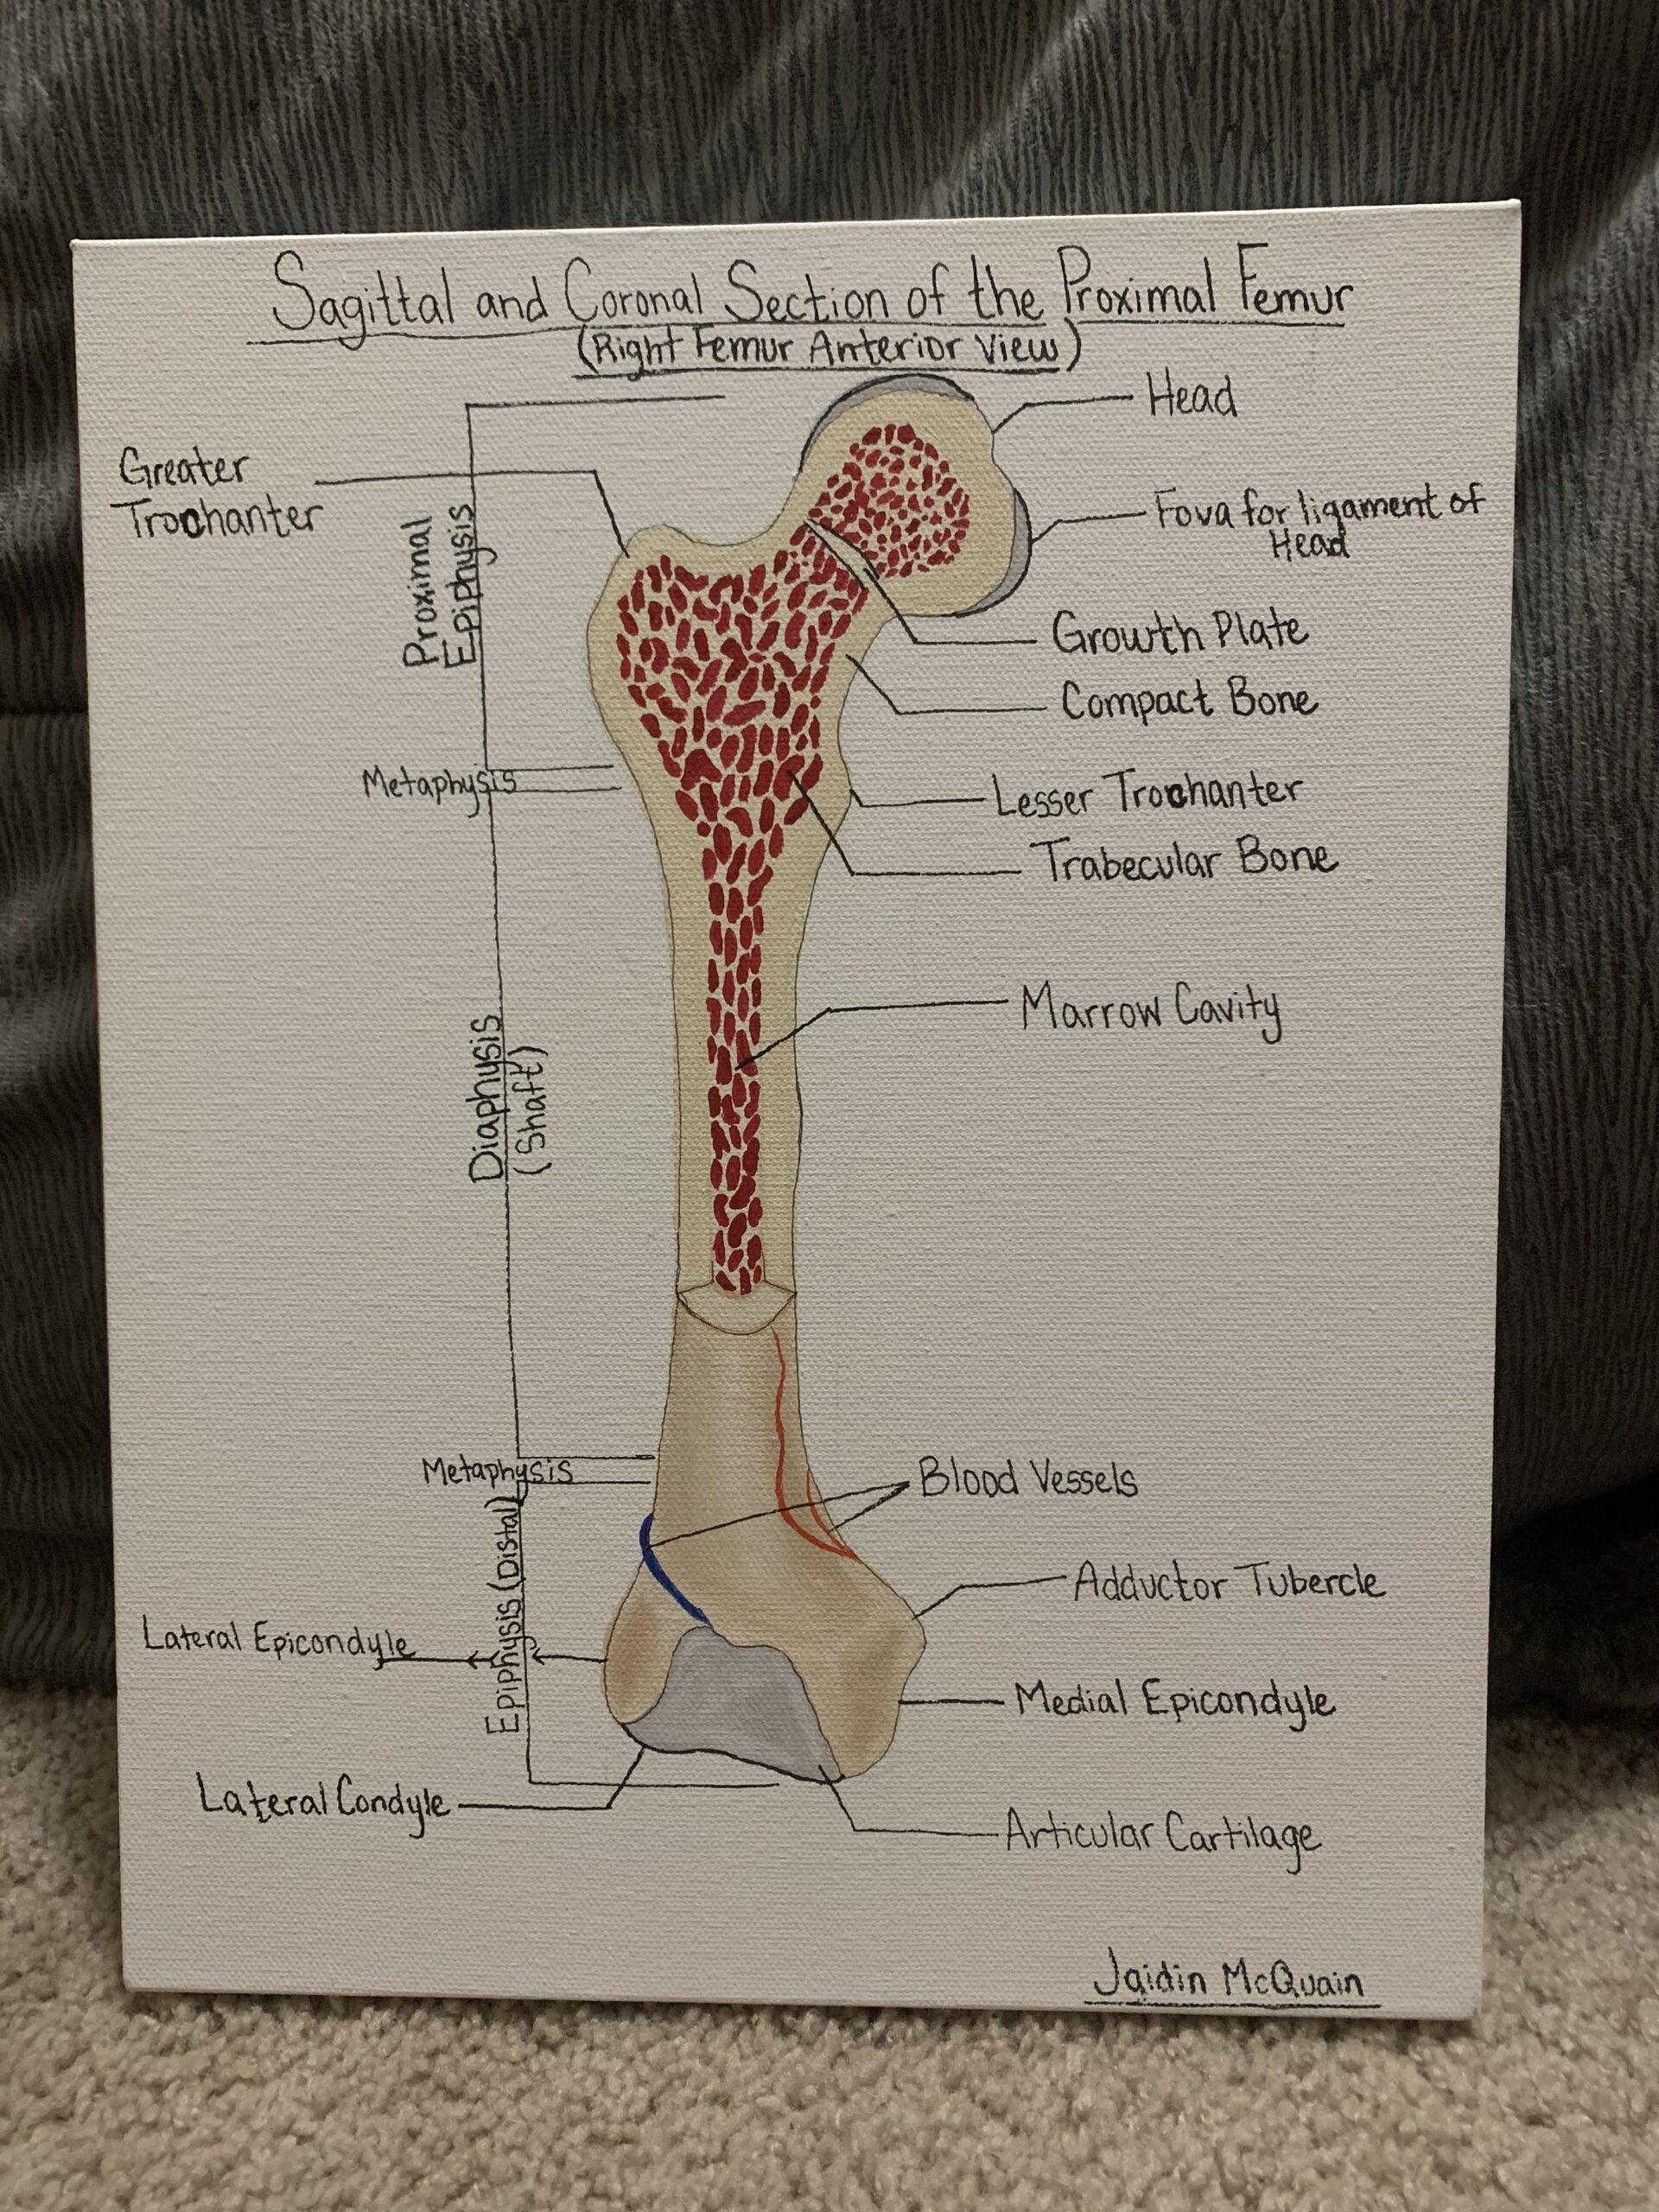 Sagittal and coronal section of femur